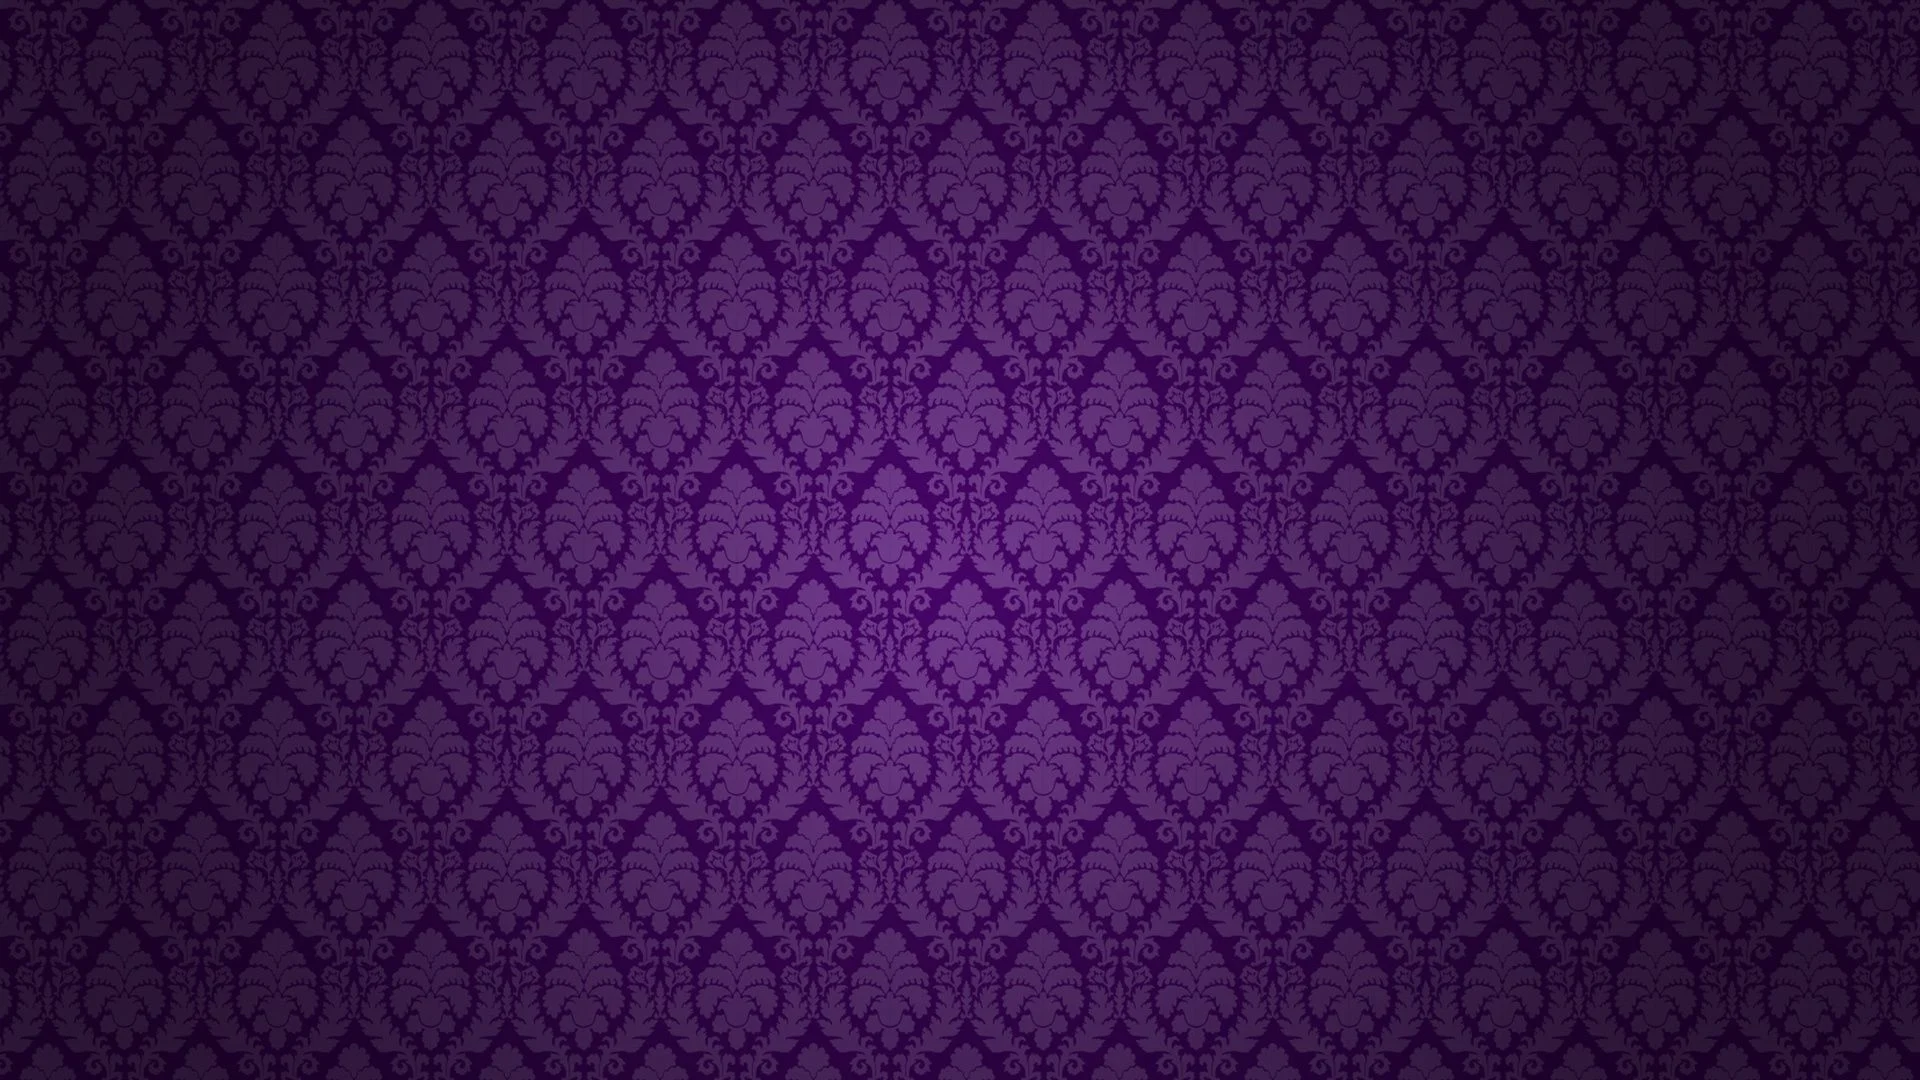 purple background - wallpaperaccess